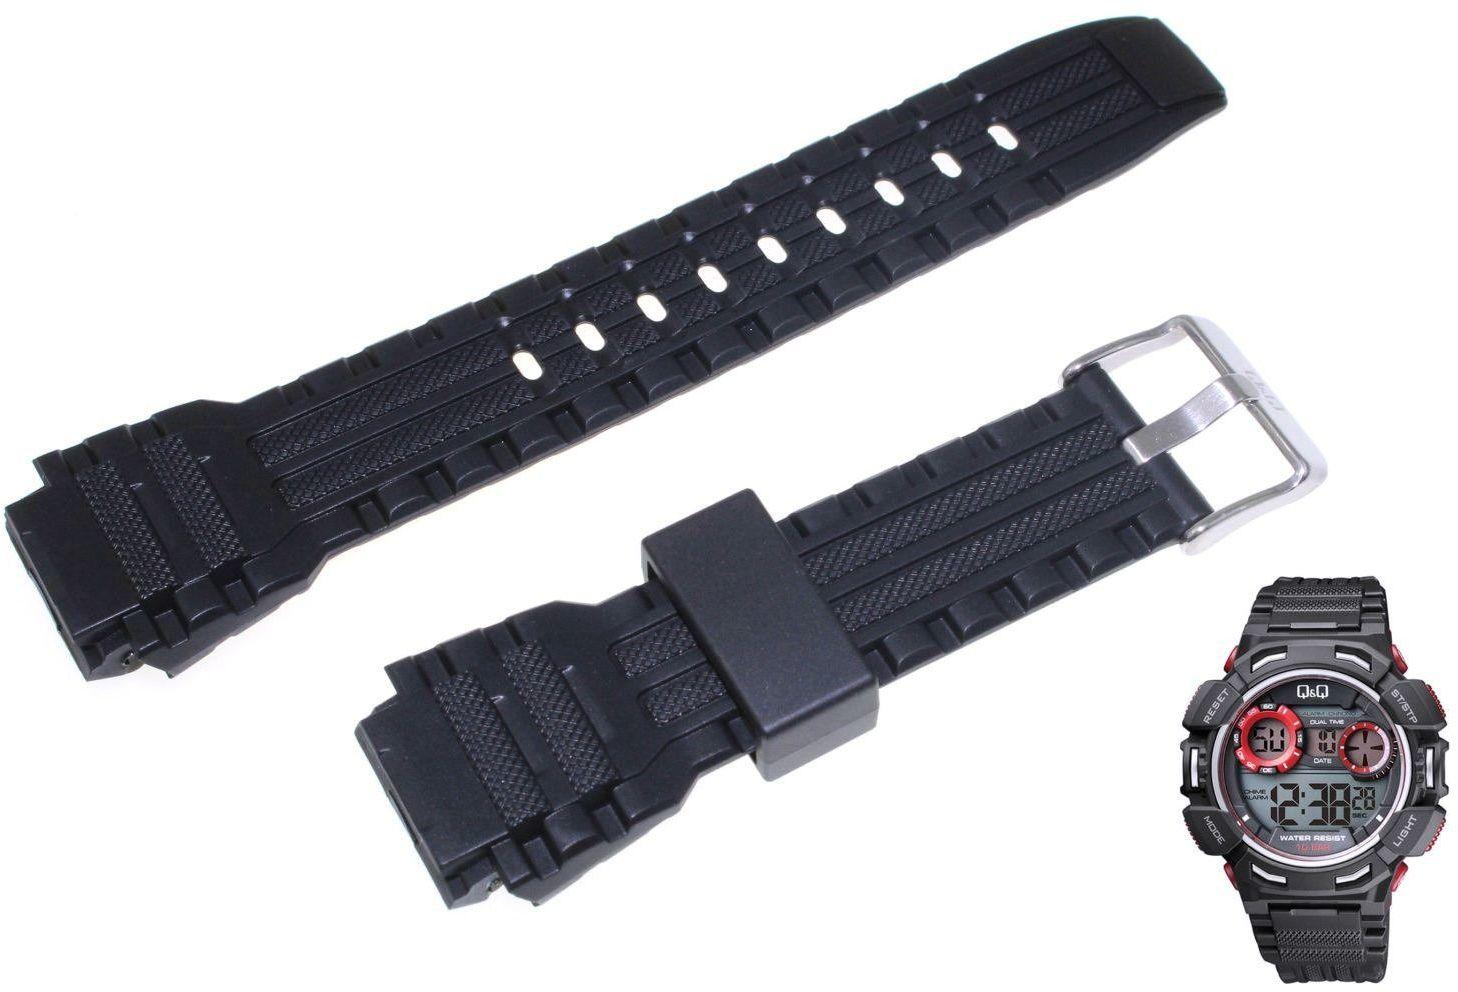 Pasek do zegarka Q&Q M148-002 20 mm Tworzywo